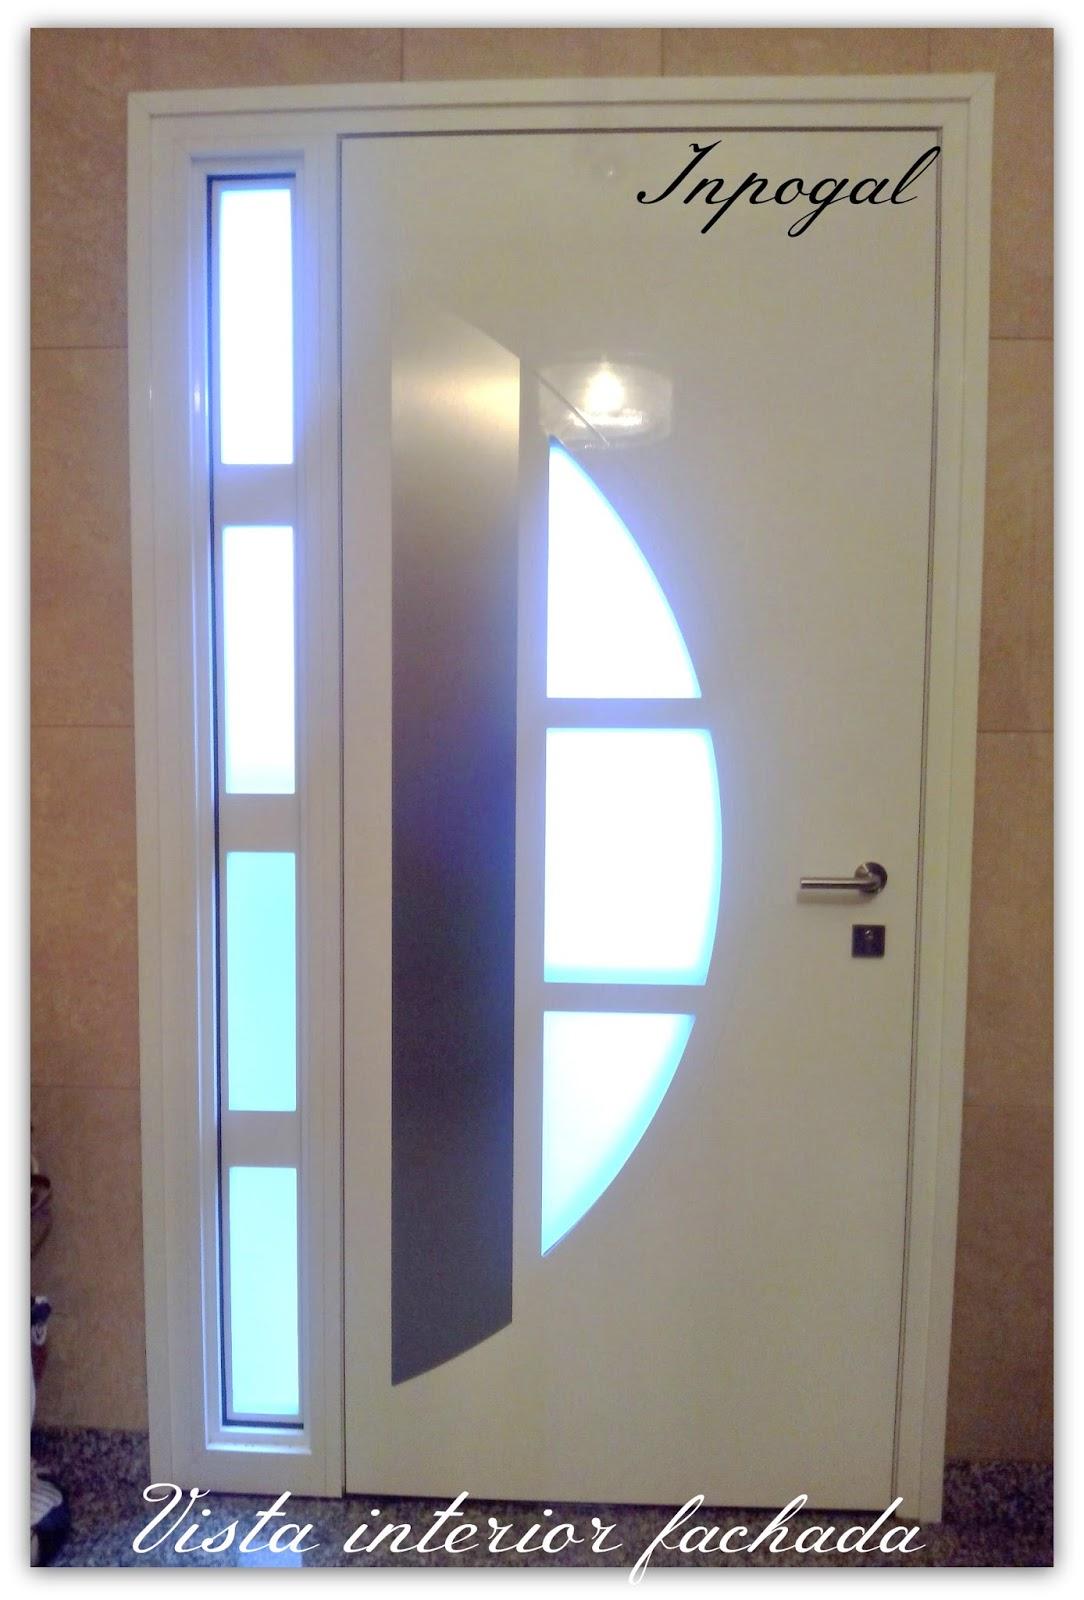 Puertas aluminio inpogal for Puertas entrada principal modernas